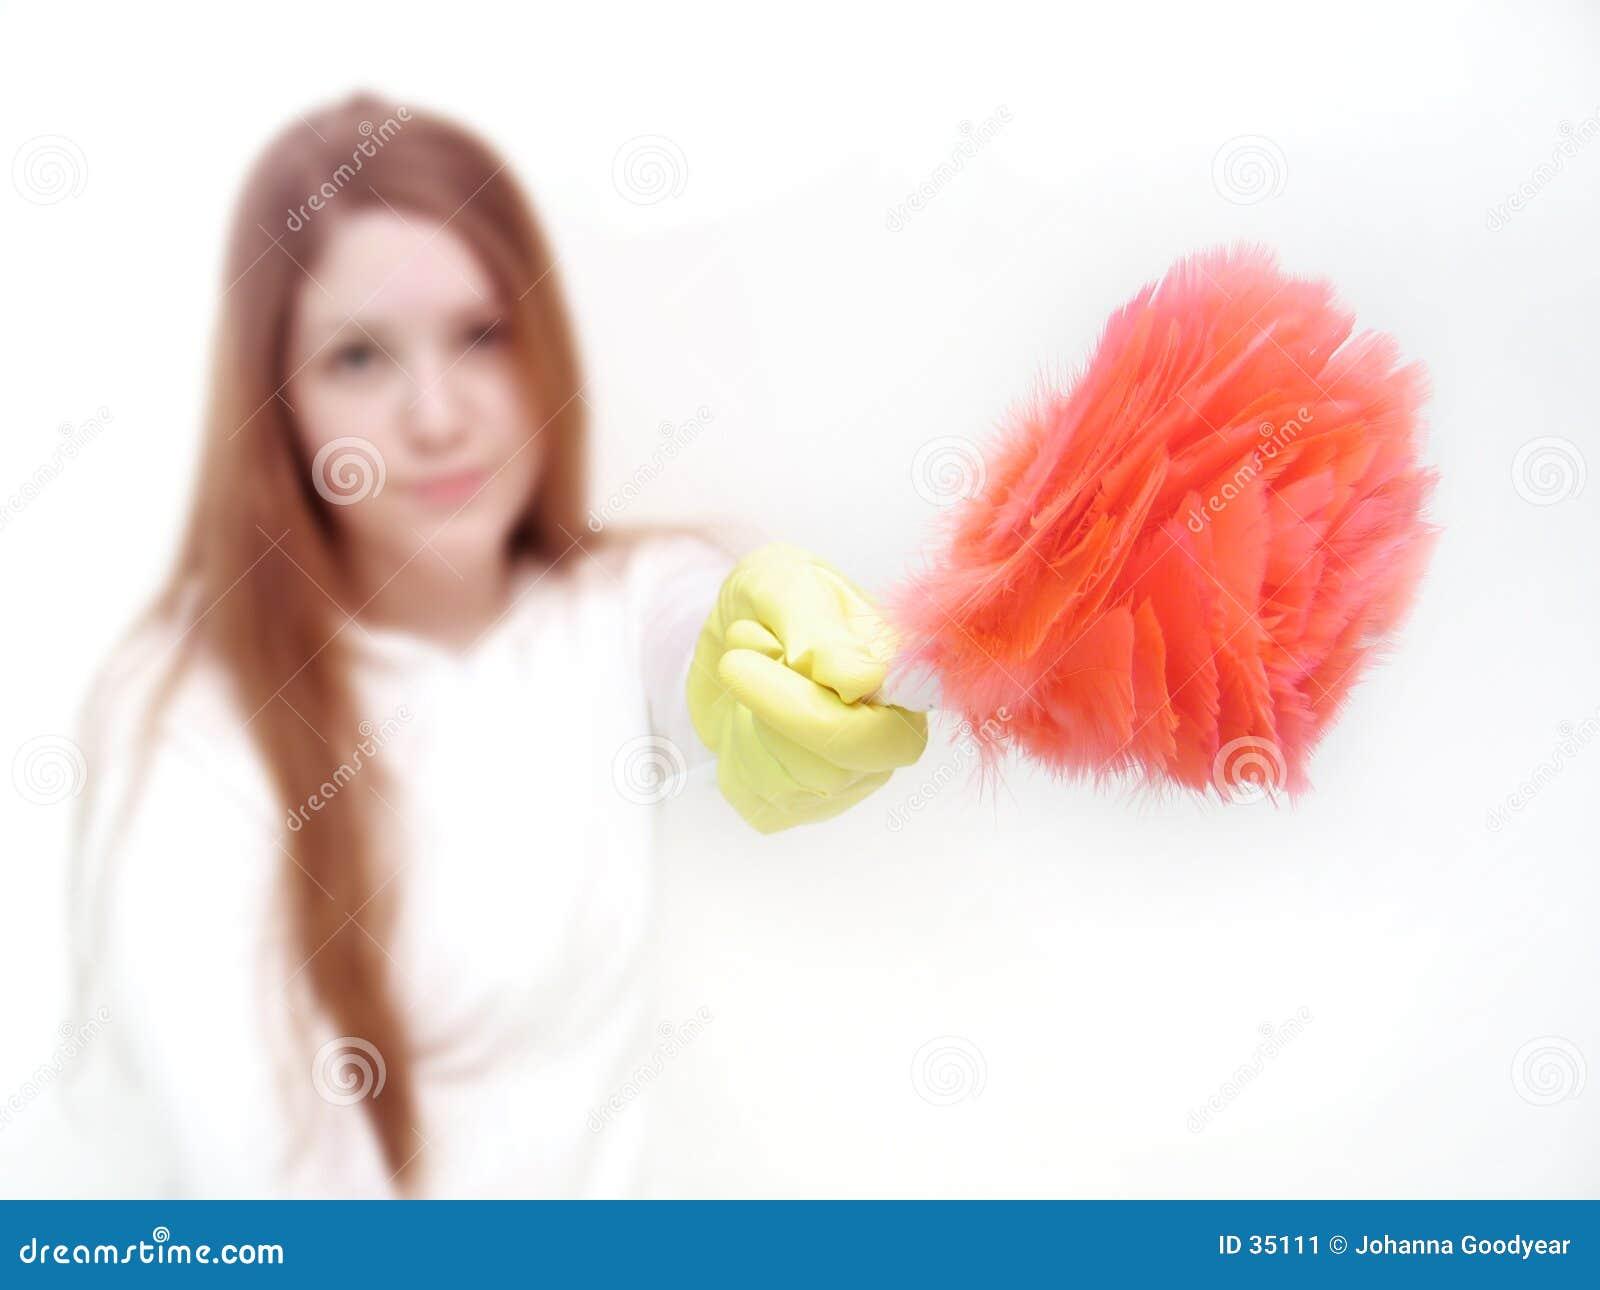 Housework 5